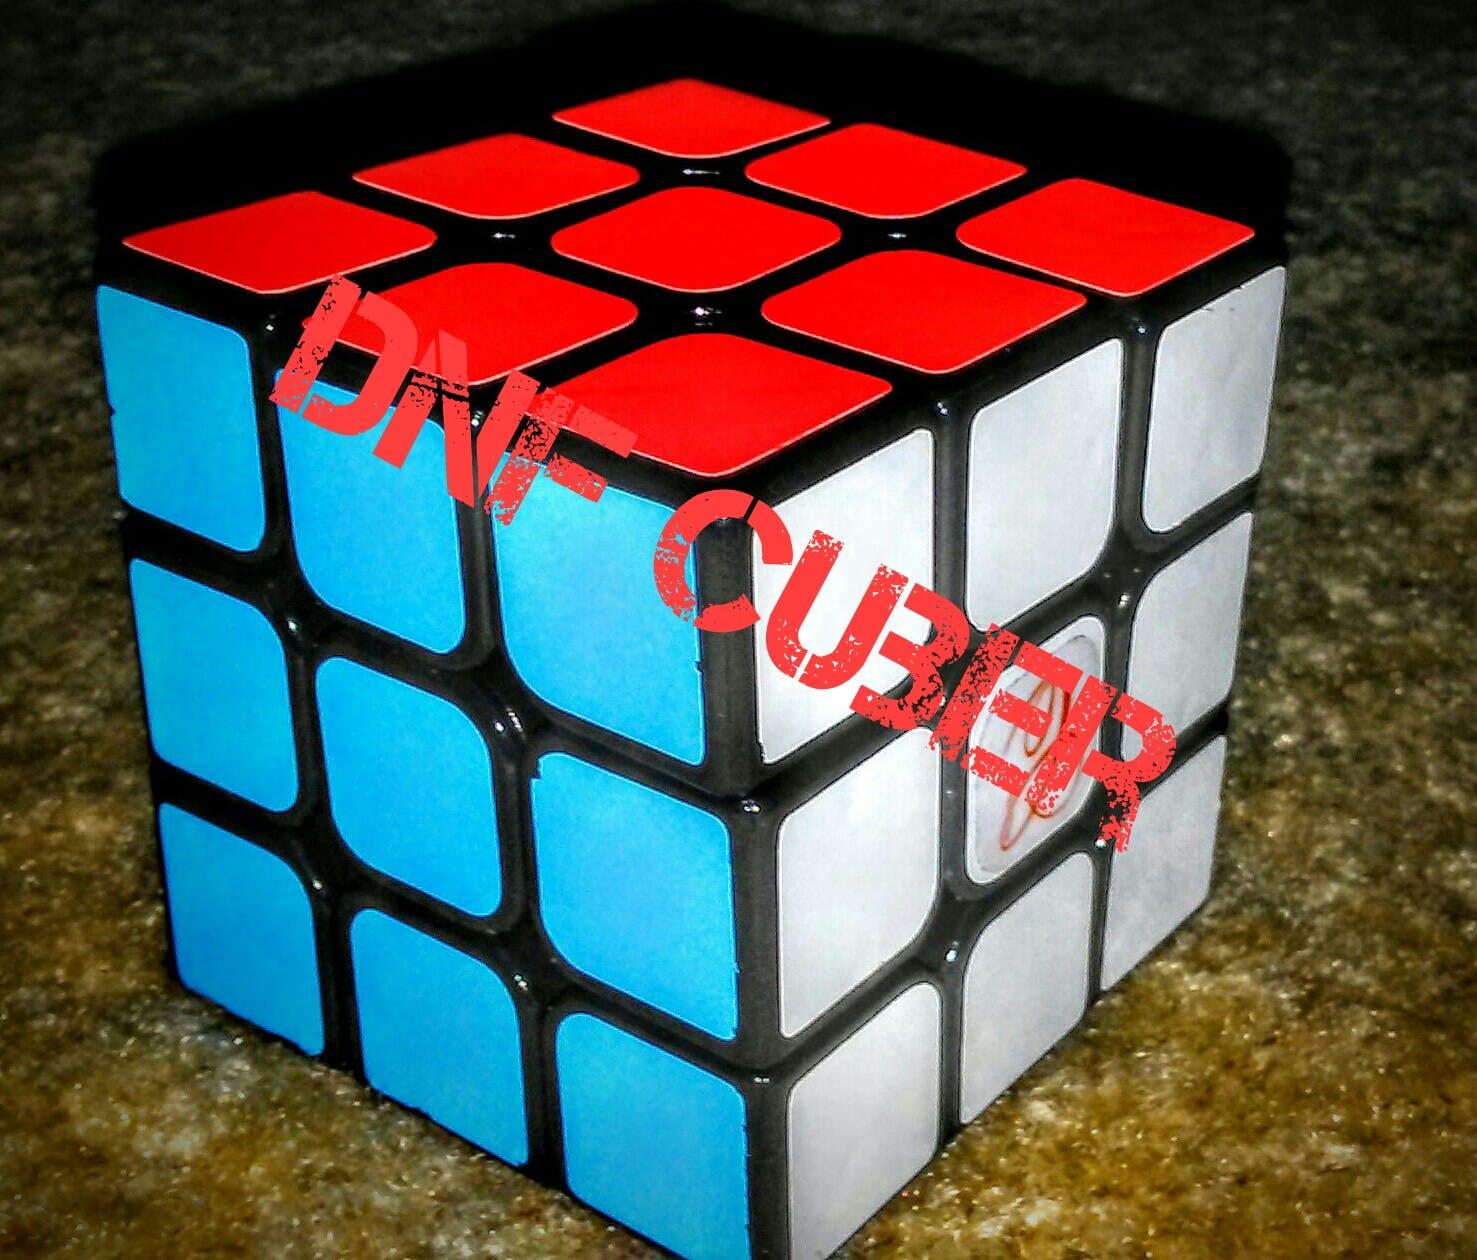 YuXin Blue 4x4 | CubeDepot